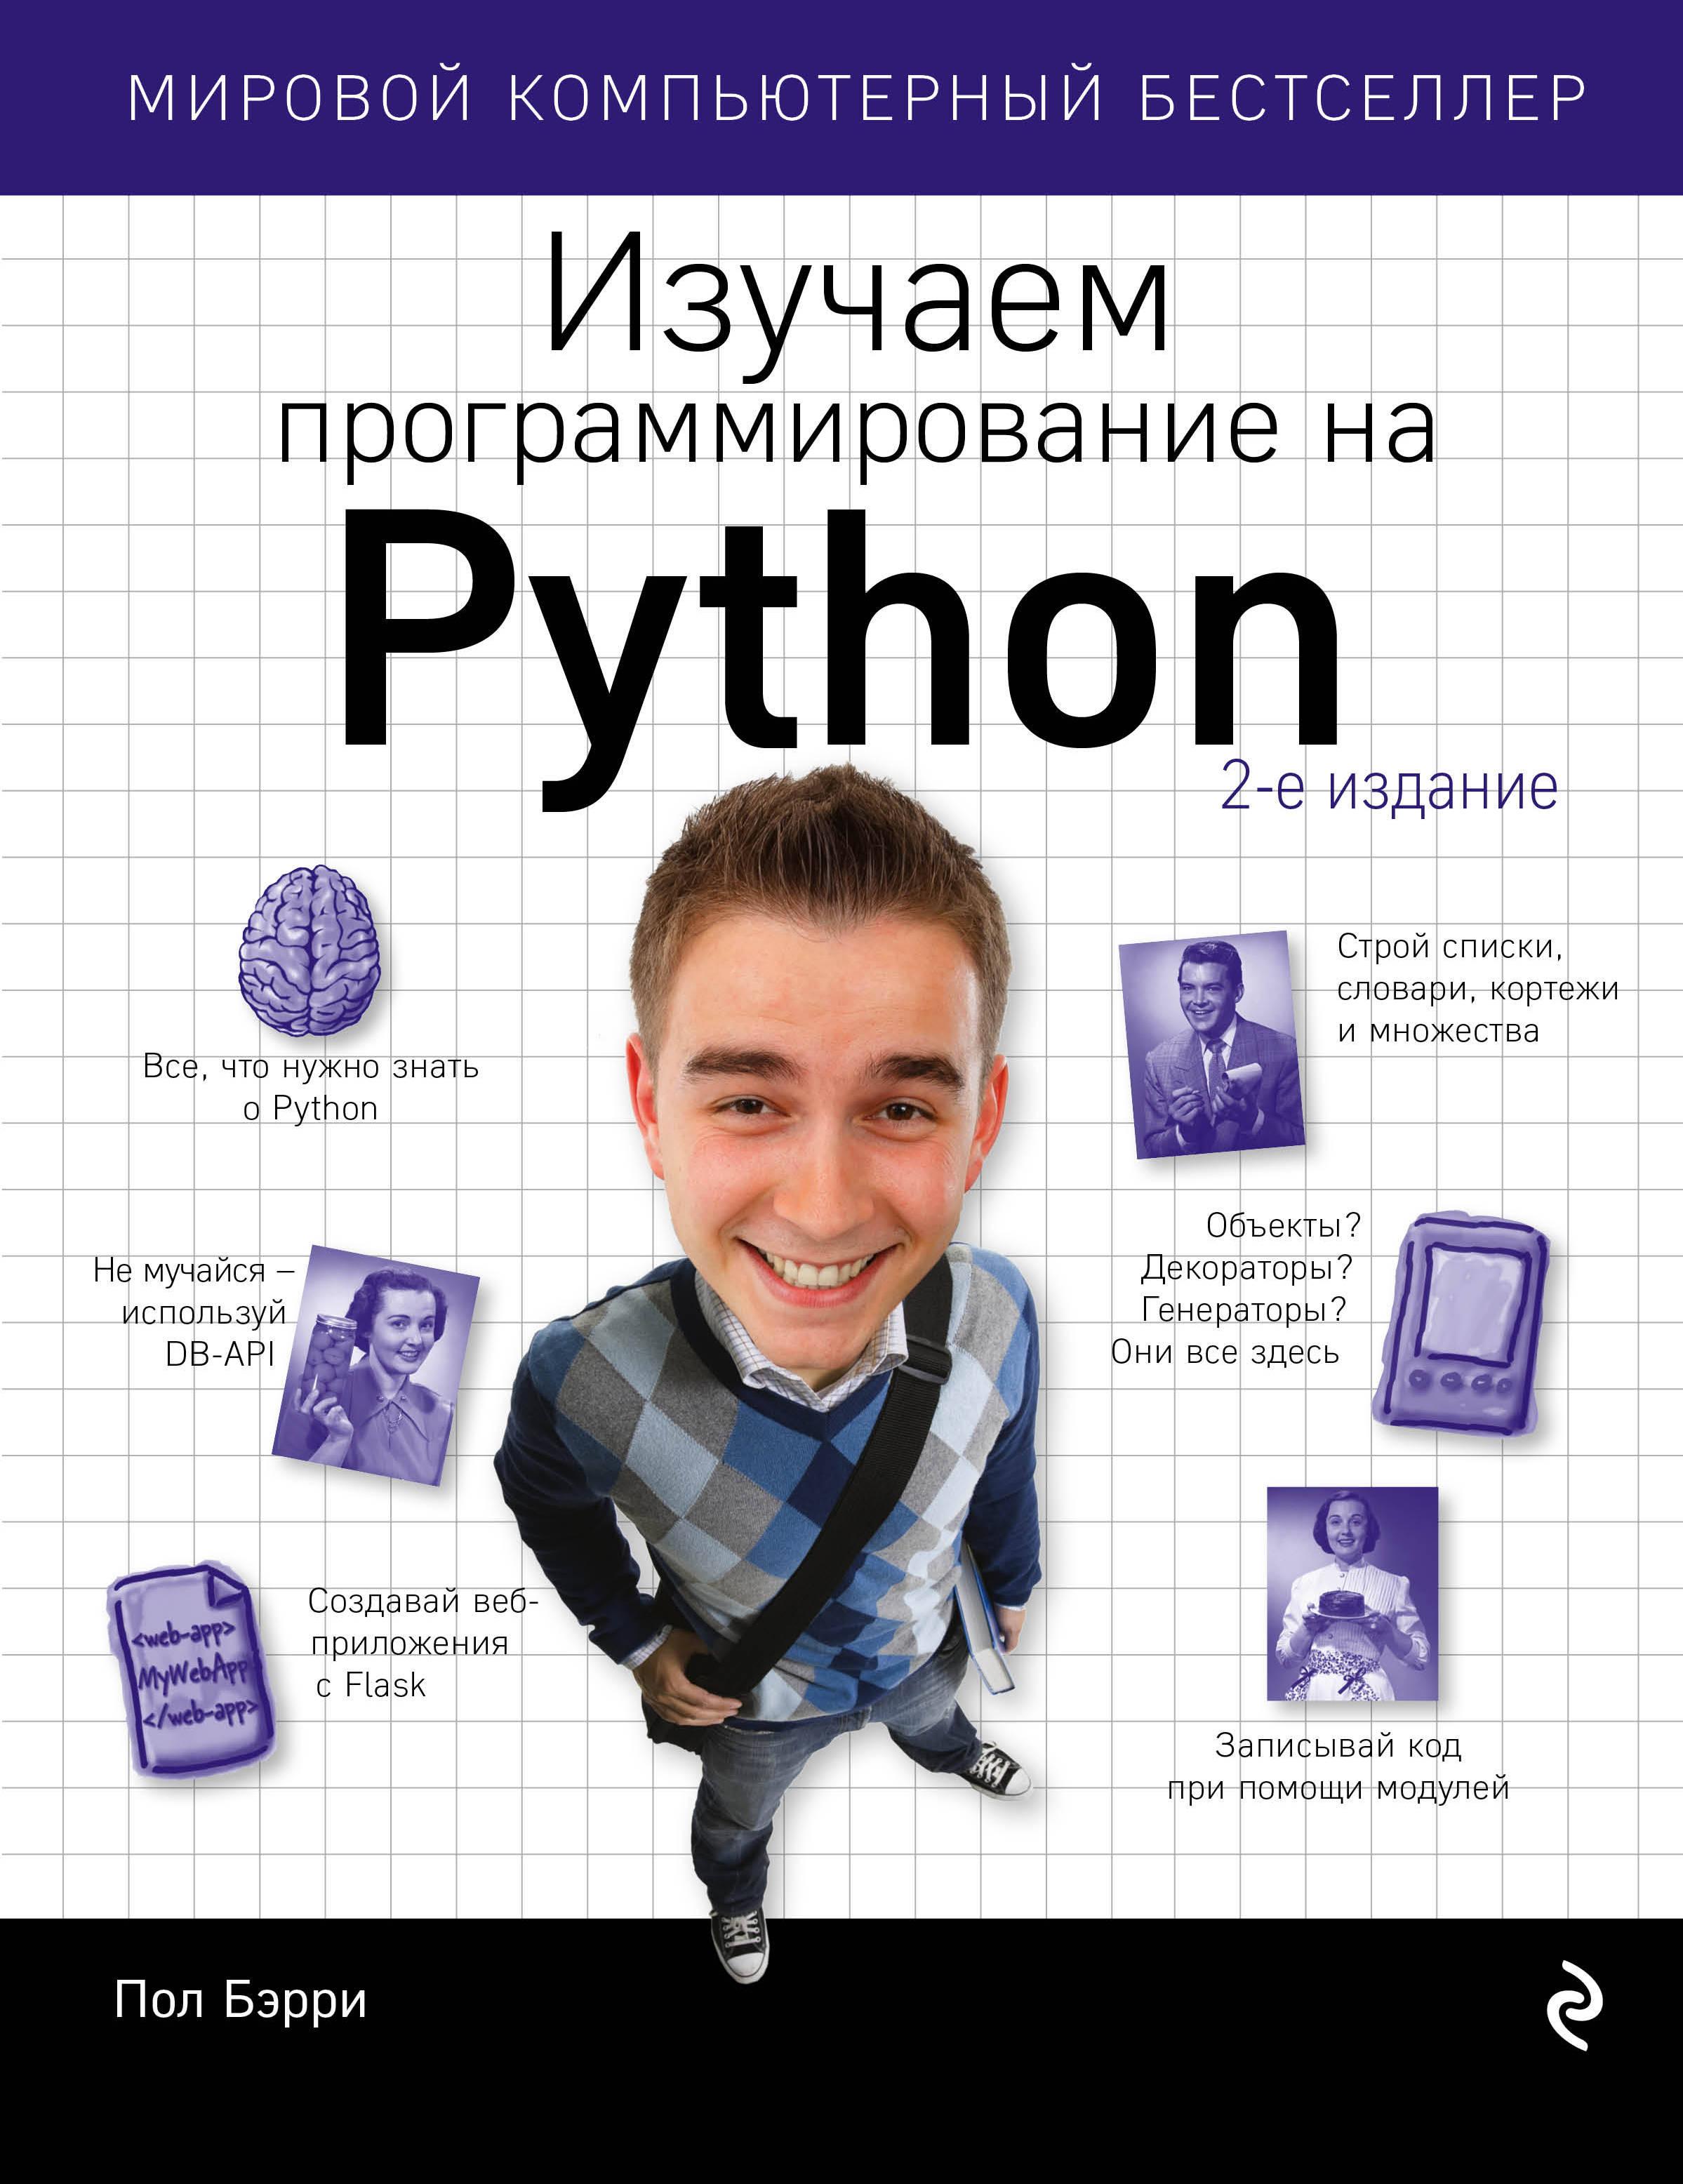 head first python - HD